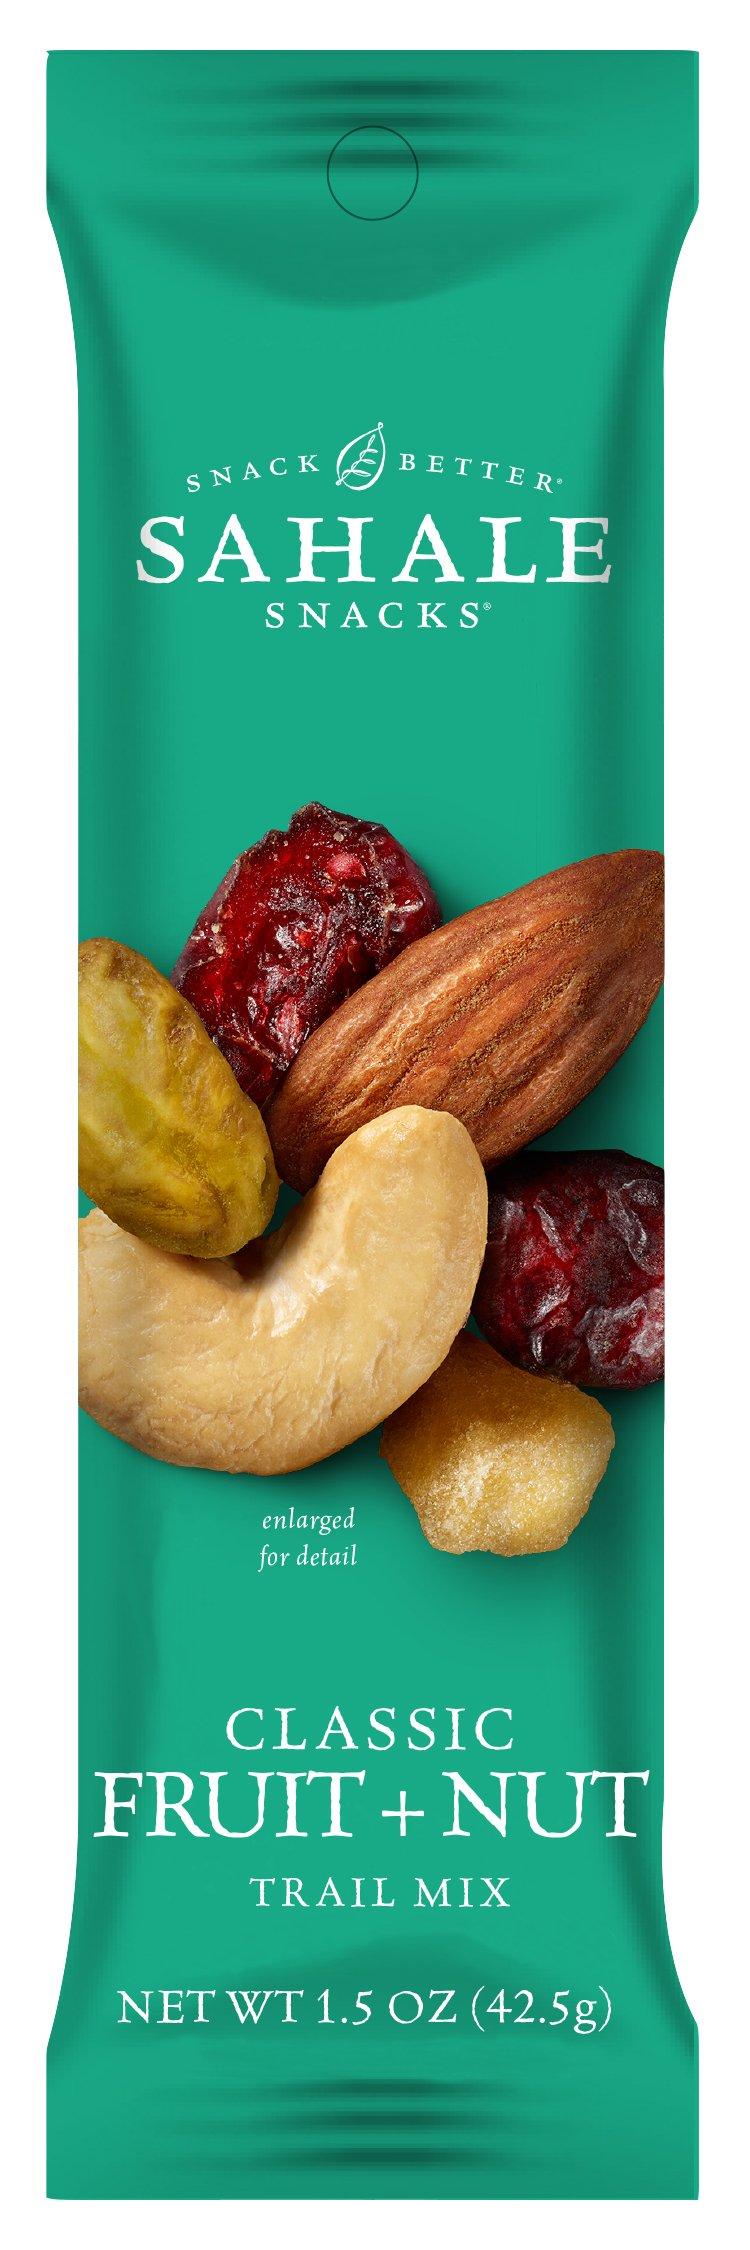 Sahale Snacks Classic Fruit Plus Nut Blend